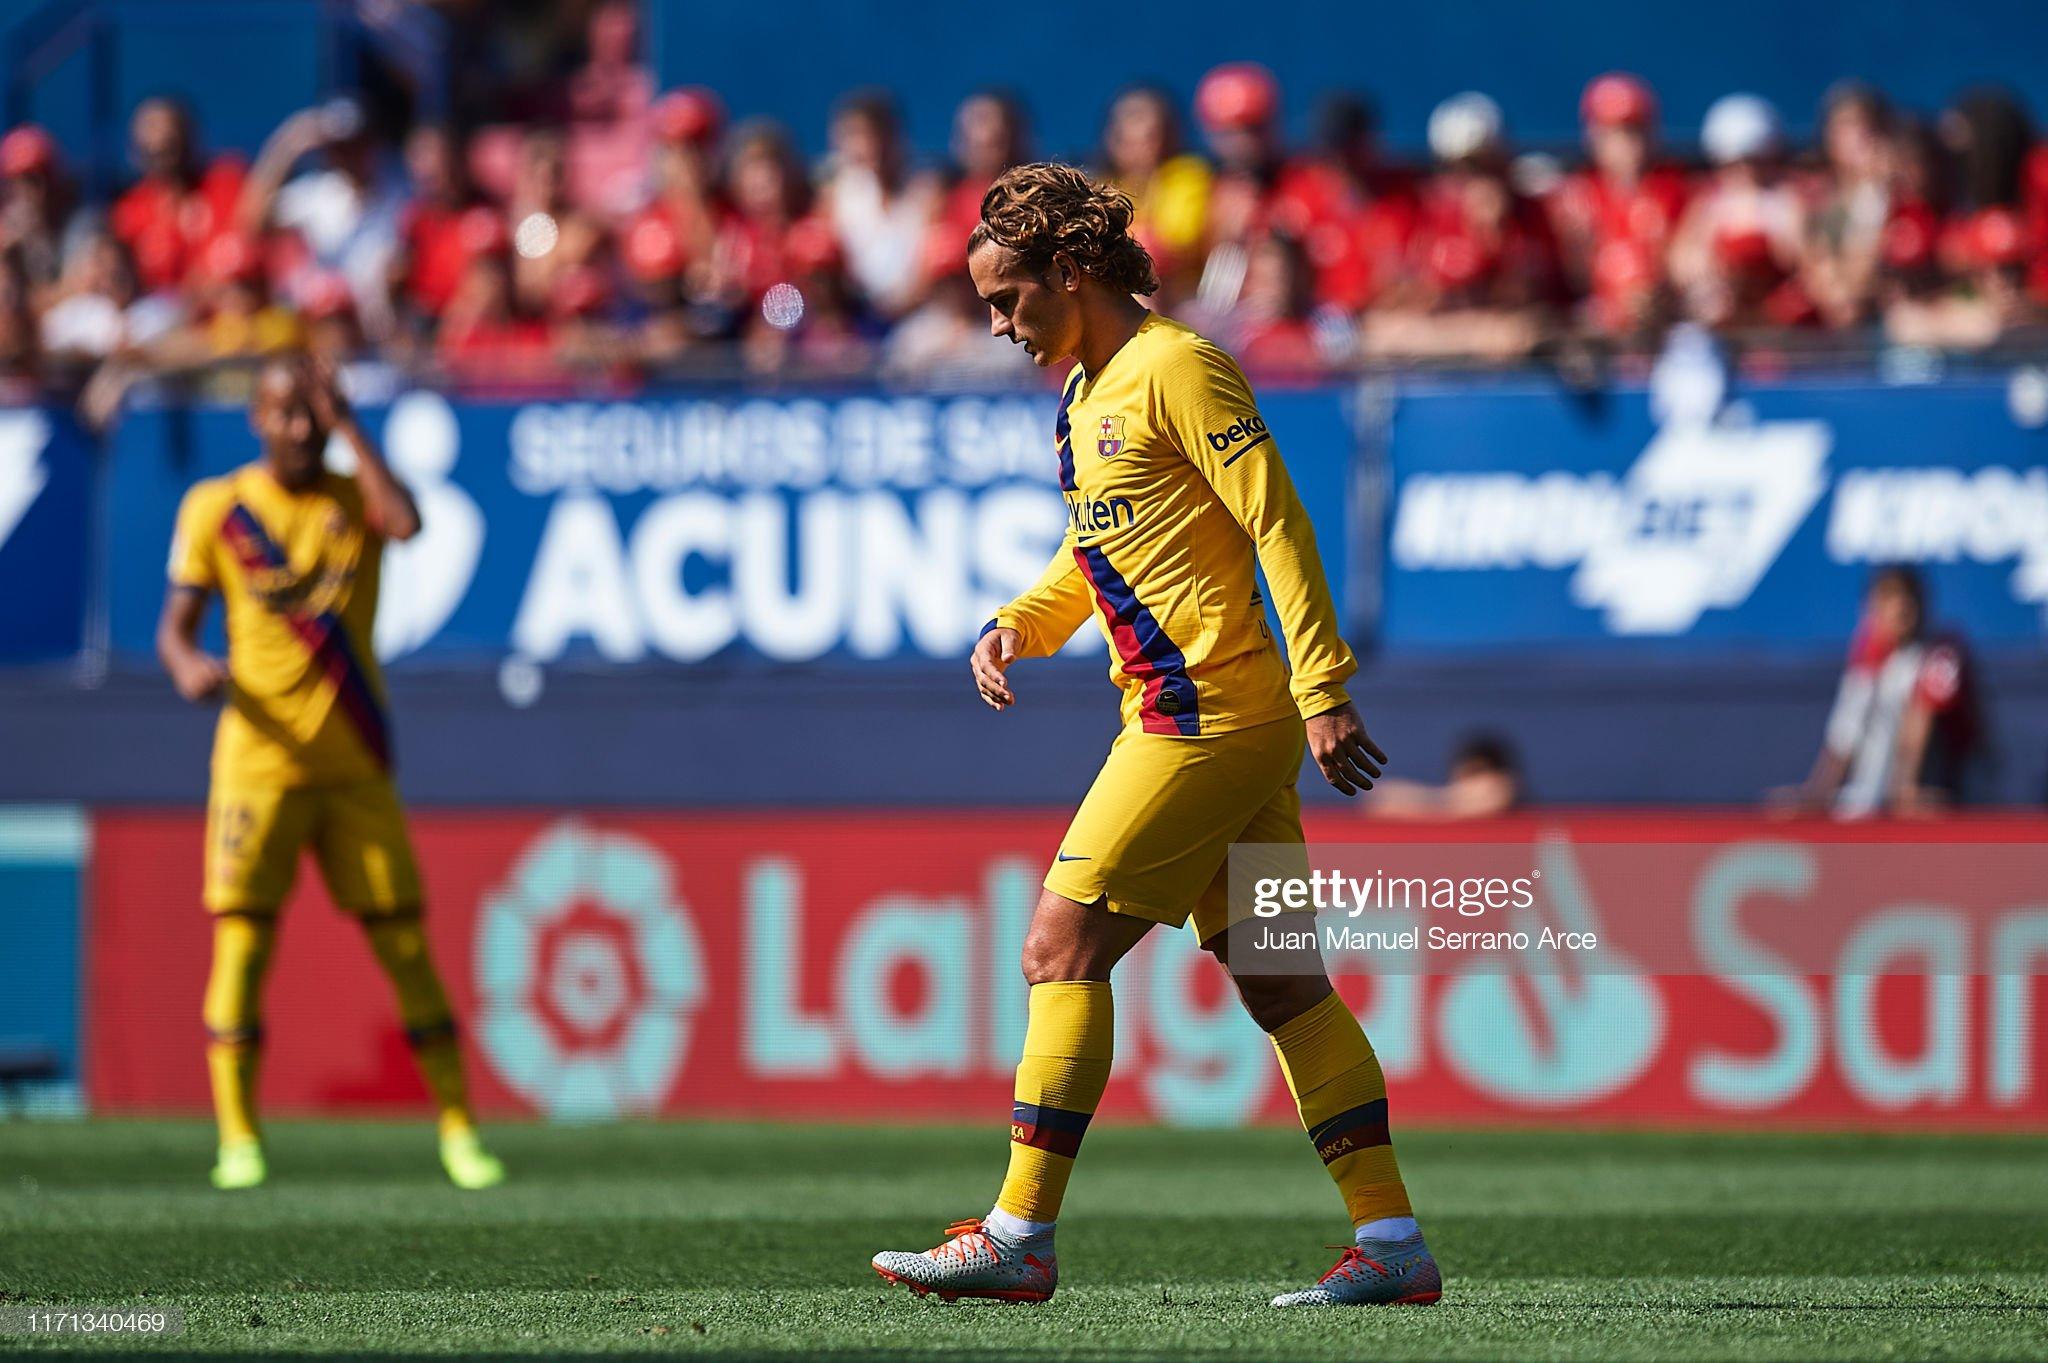 صور مباراة : أوساسونا - برشلونة 2-2 ( 31-08-2019 )  Antoine-griezmann-of-fc-barcelona-looks-on-during-the-liga-match-ca-picture-id1171340469?s=2048x2048